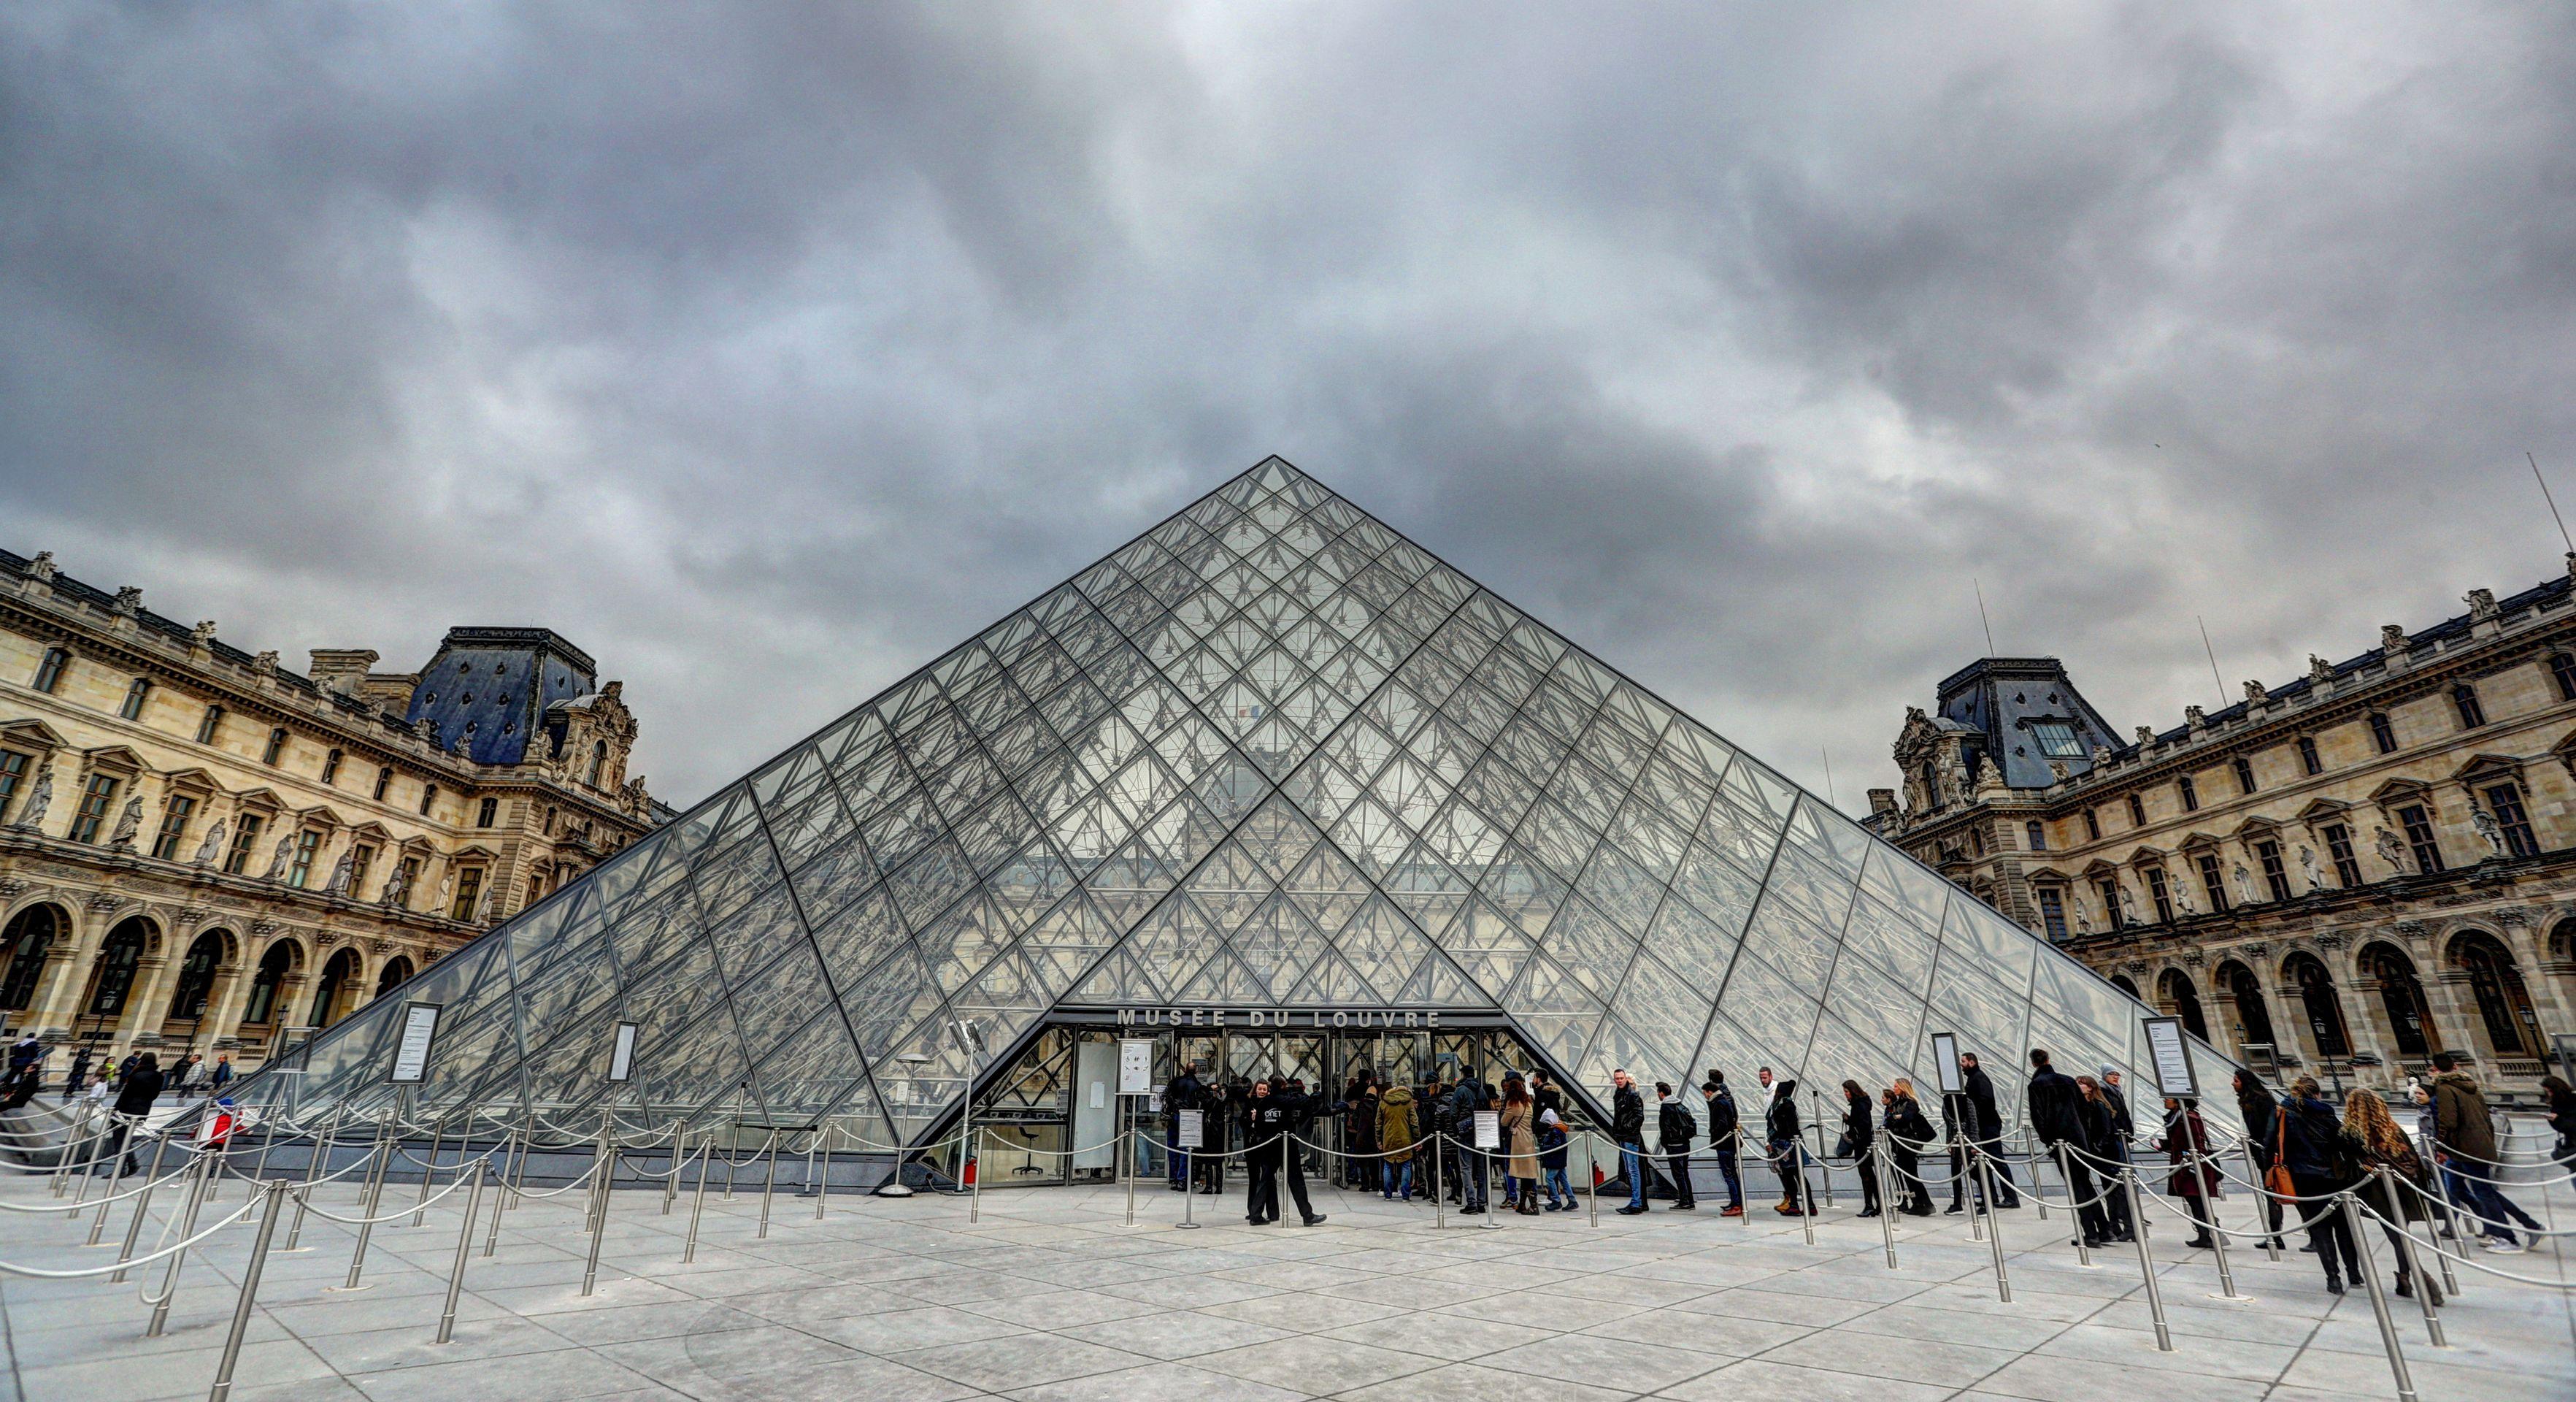 Ponovno otvoren muzej Louvre u Parizu